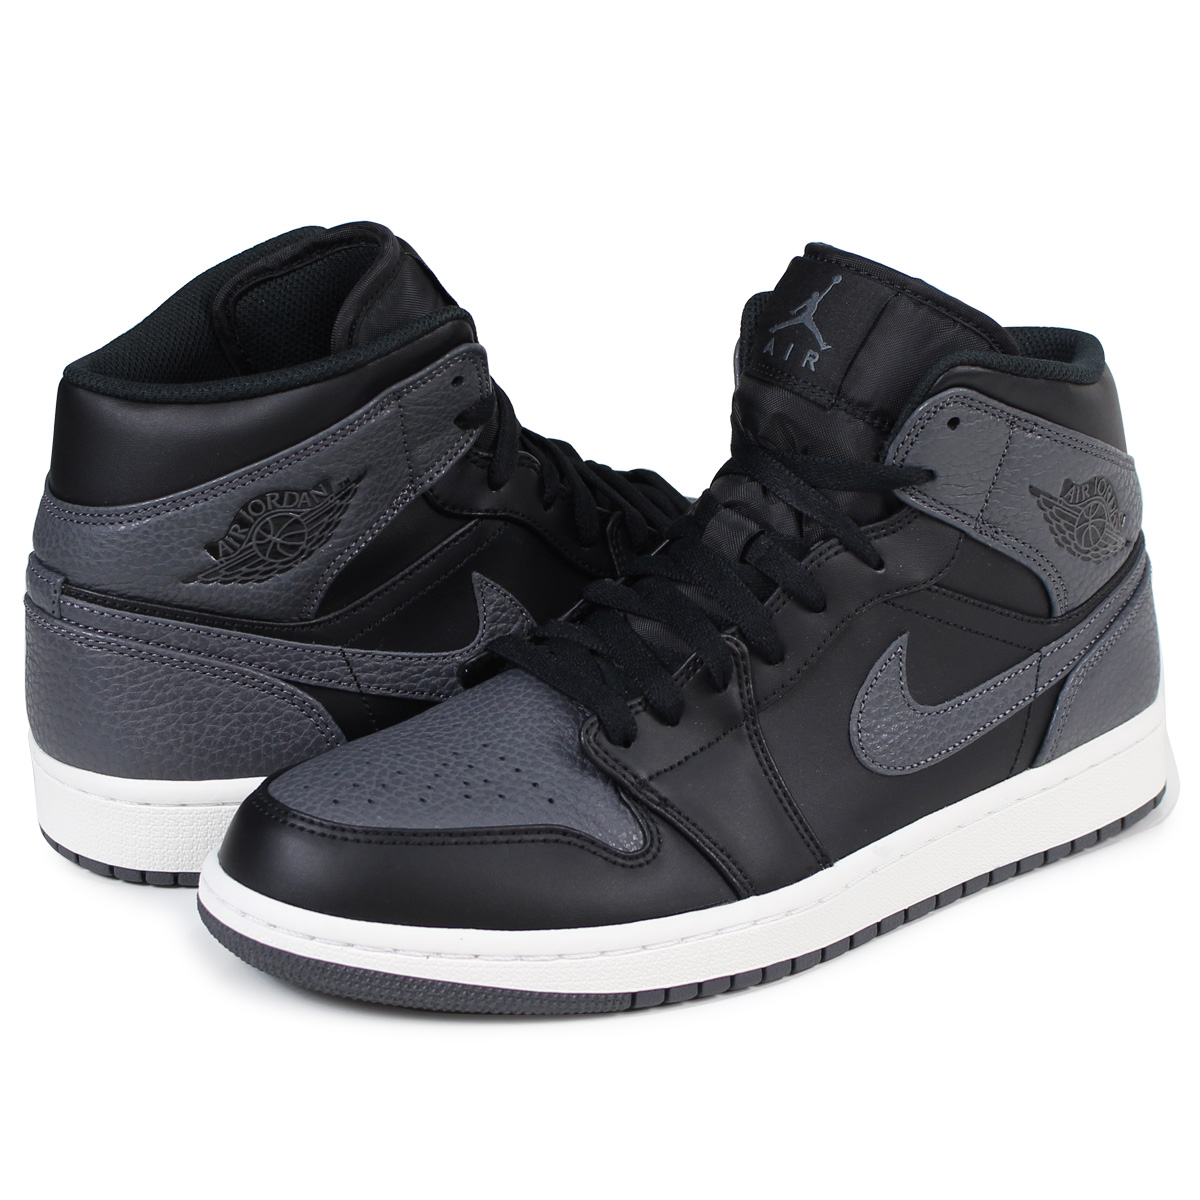 innovative design 3f62f b53a5 NIKE AIR JORDAN 1 MID Nike Air Jordan 1 sneakers 554,724-041 men's shoes  black [1/9 Shinnyu load] [1801]